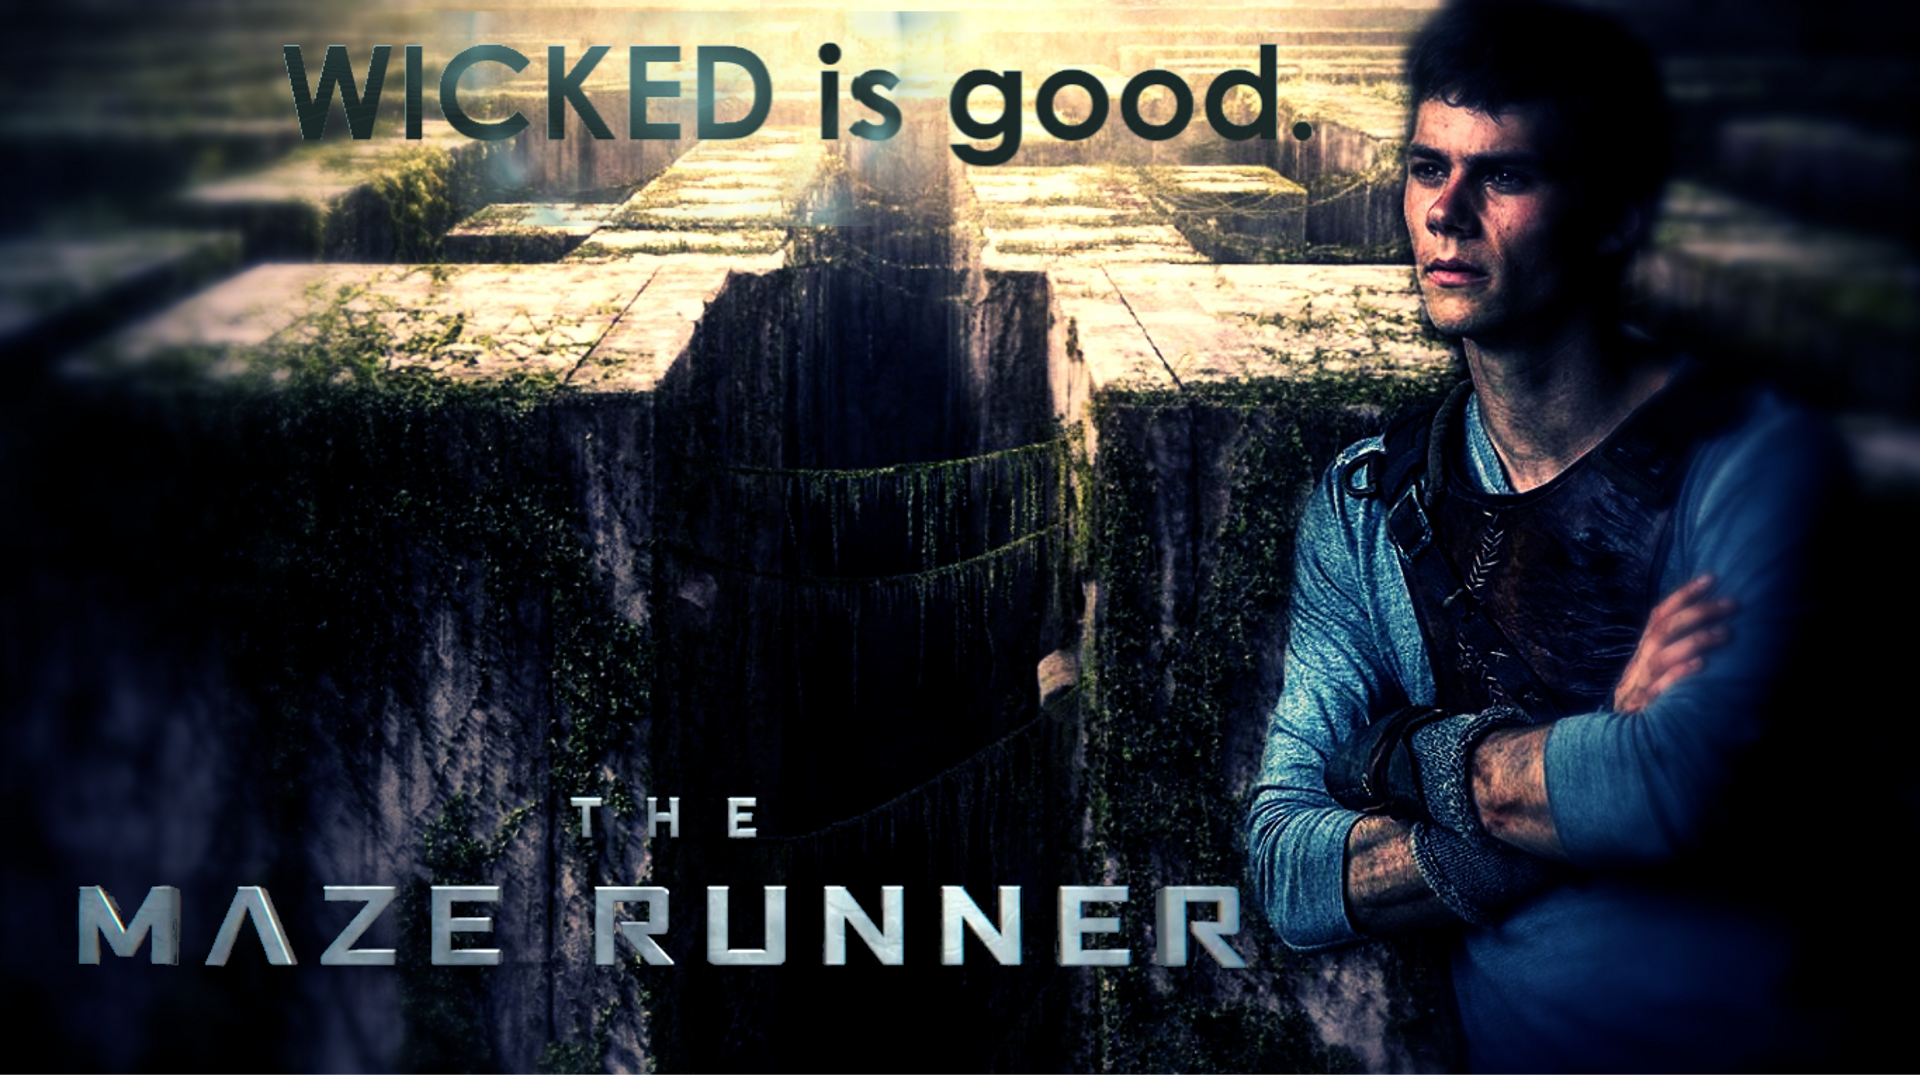 The Maze Runner Wallpaper The Maze Runner The Maze